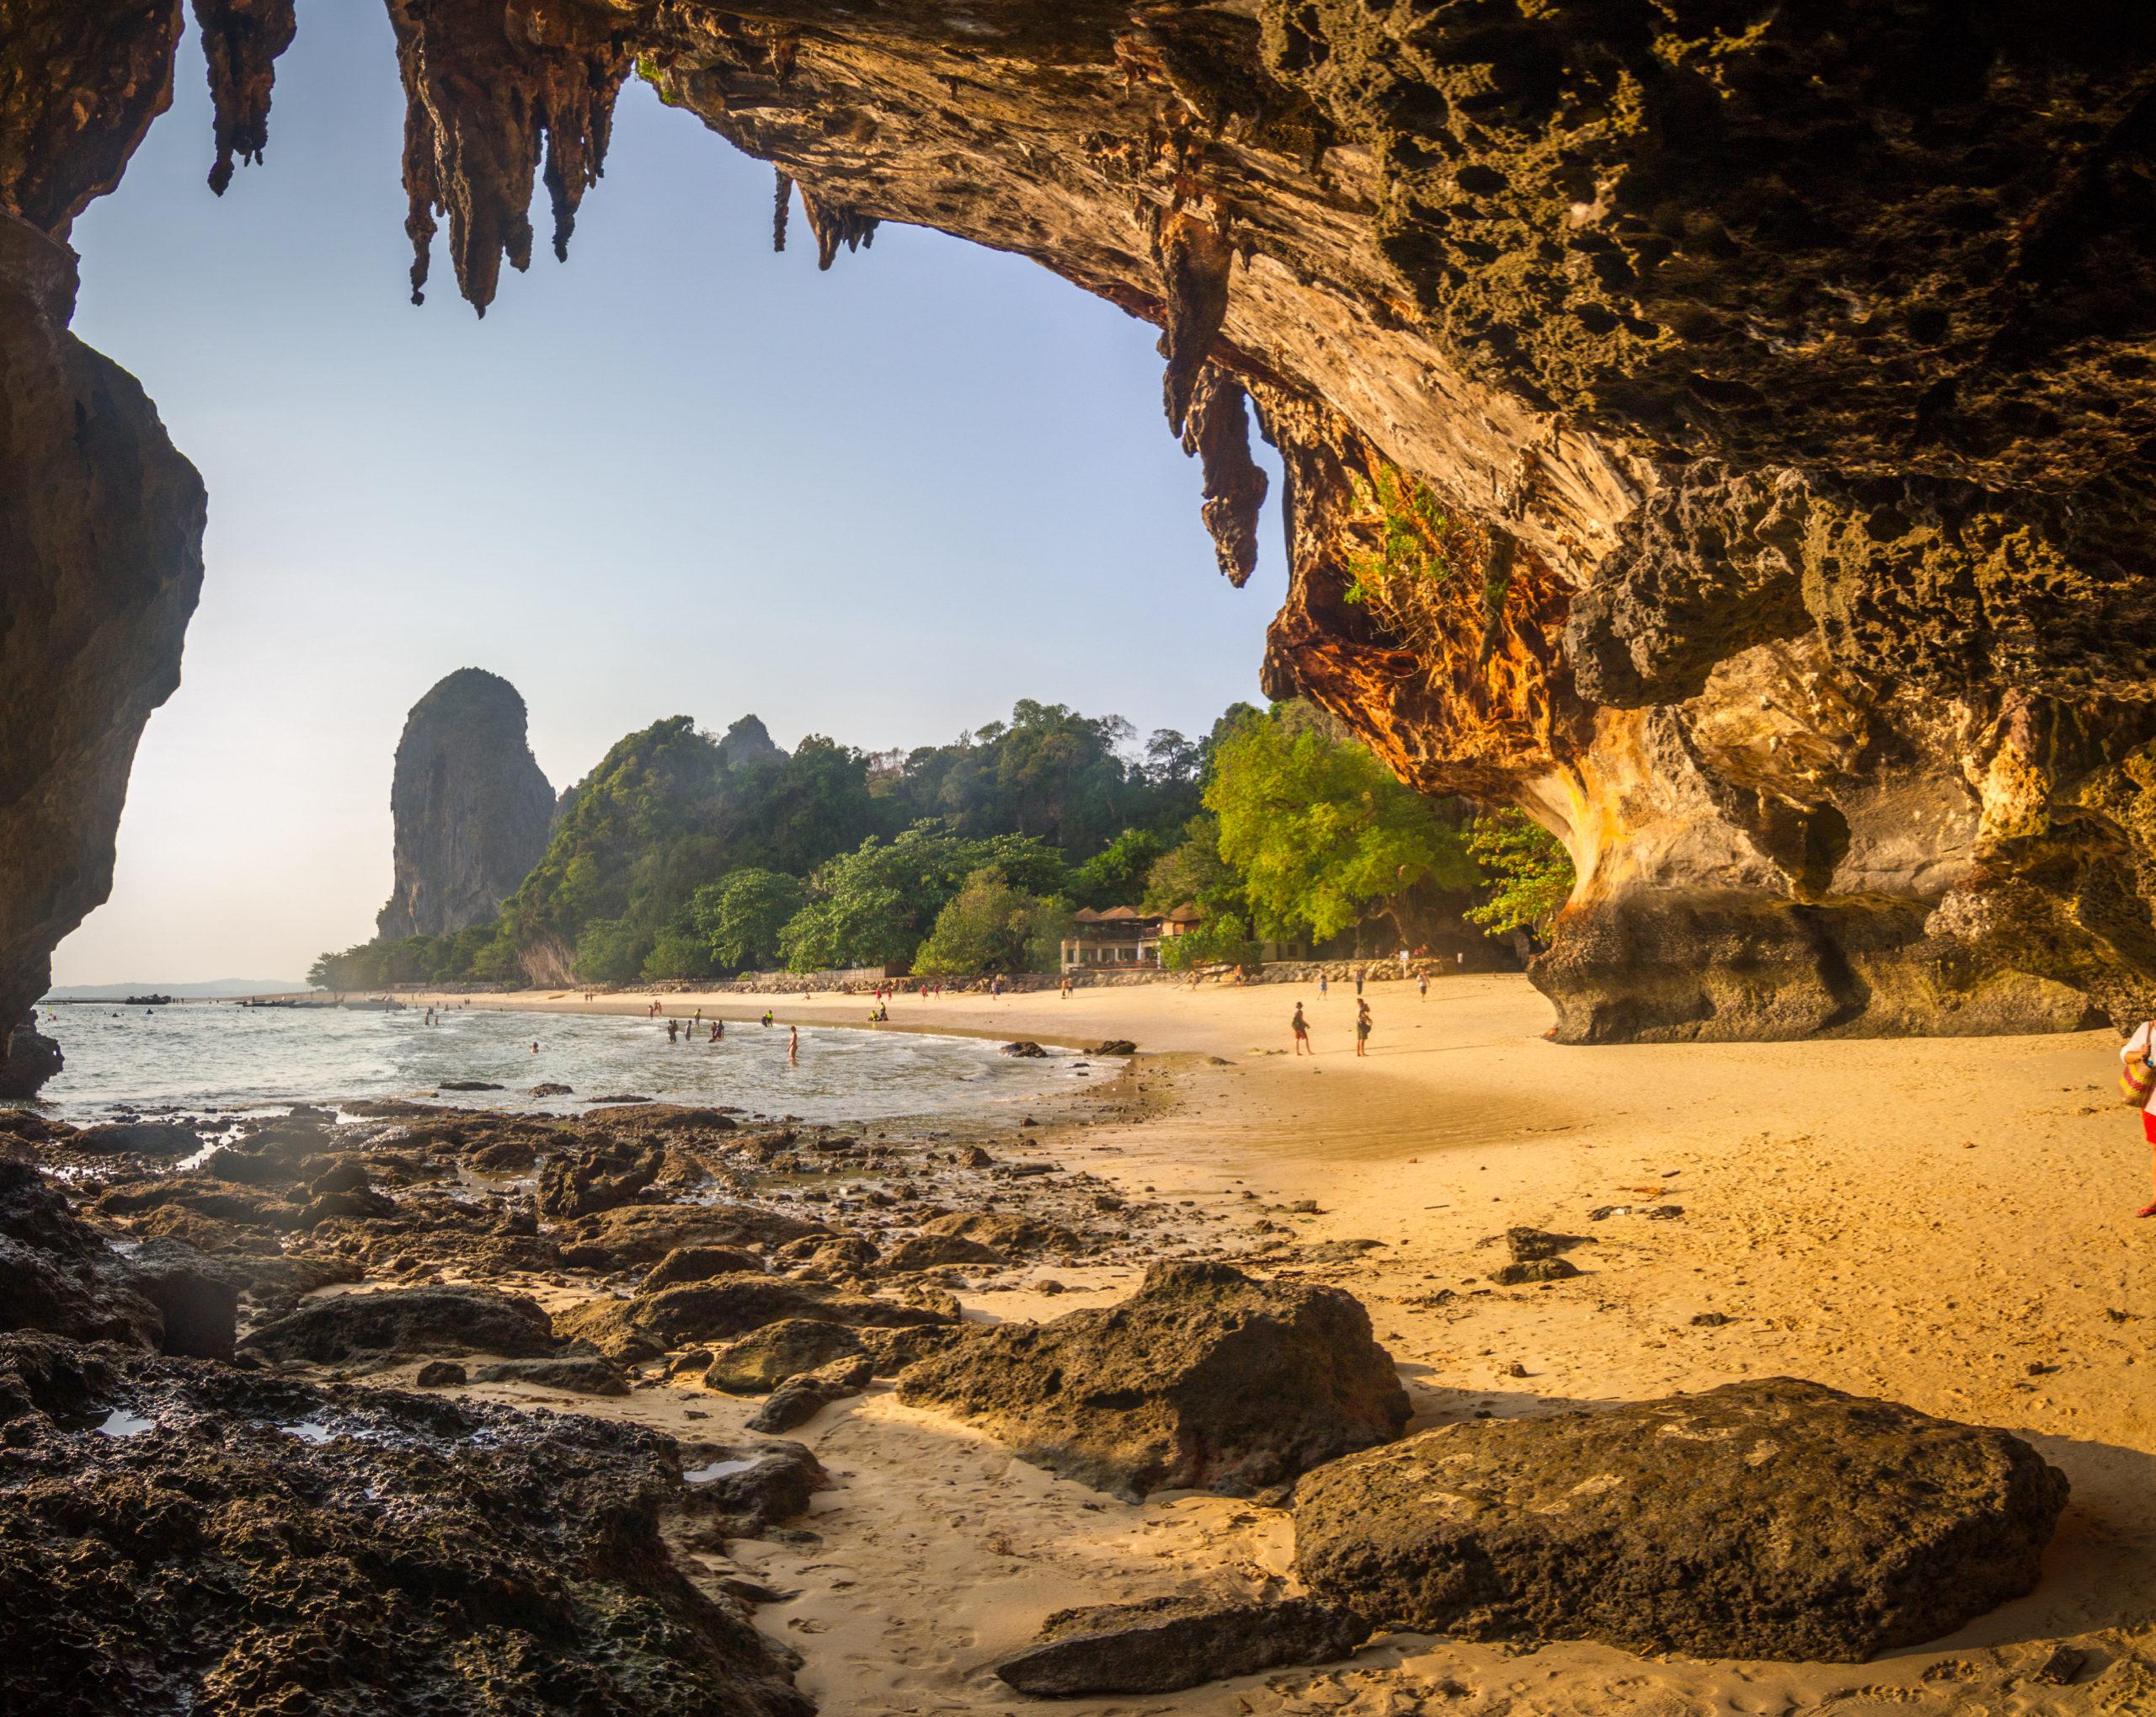 phra nang cave beach 2